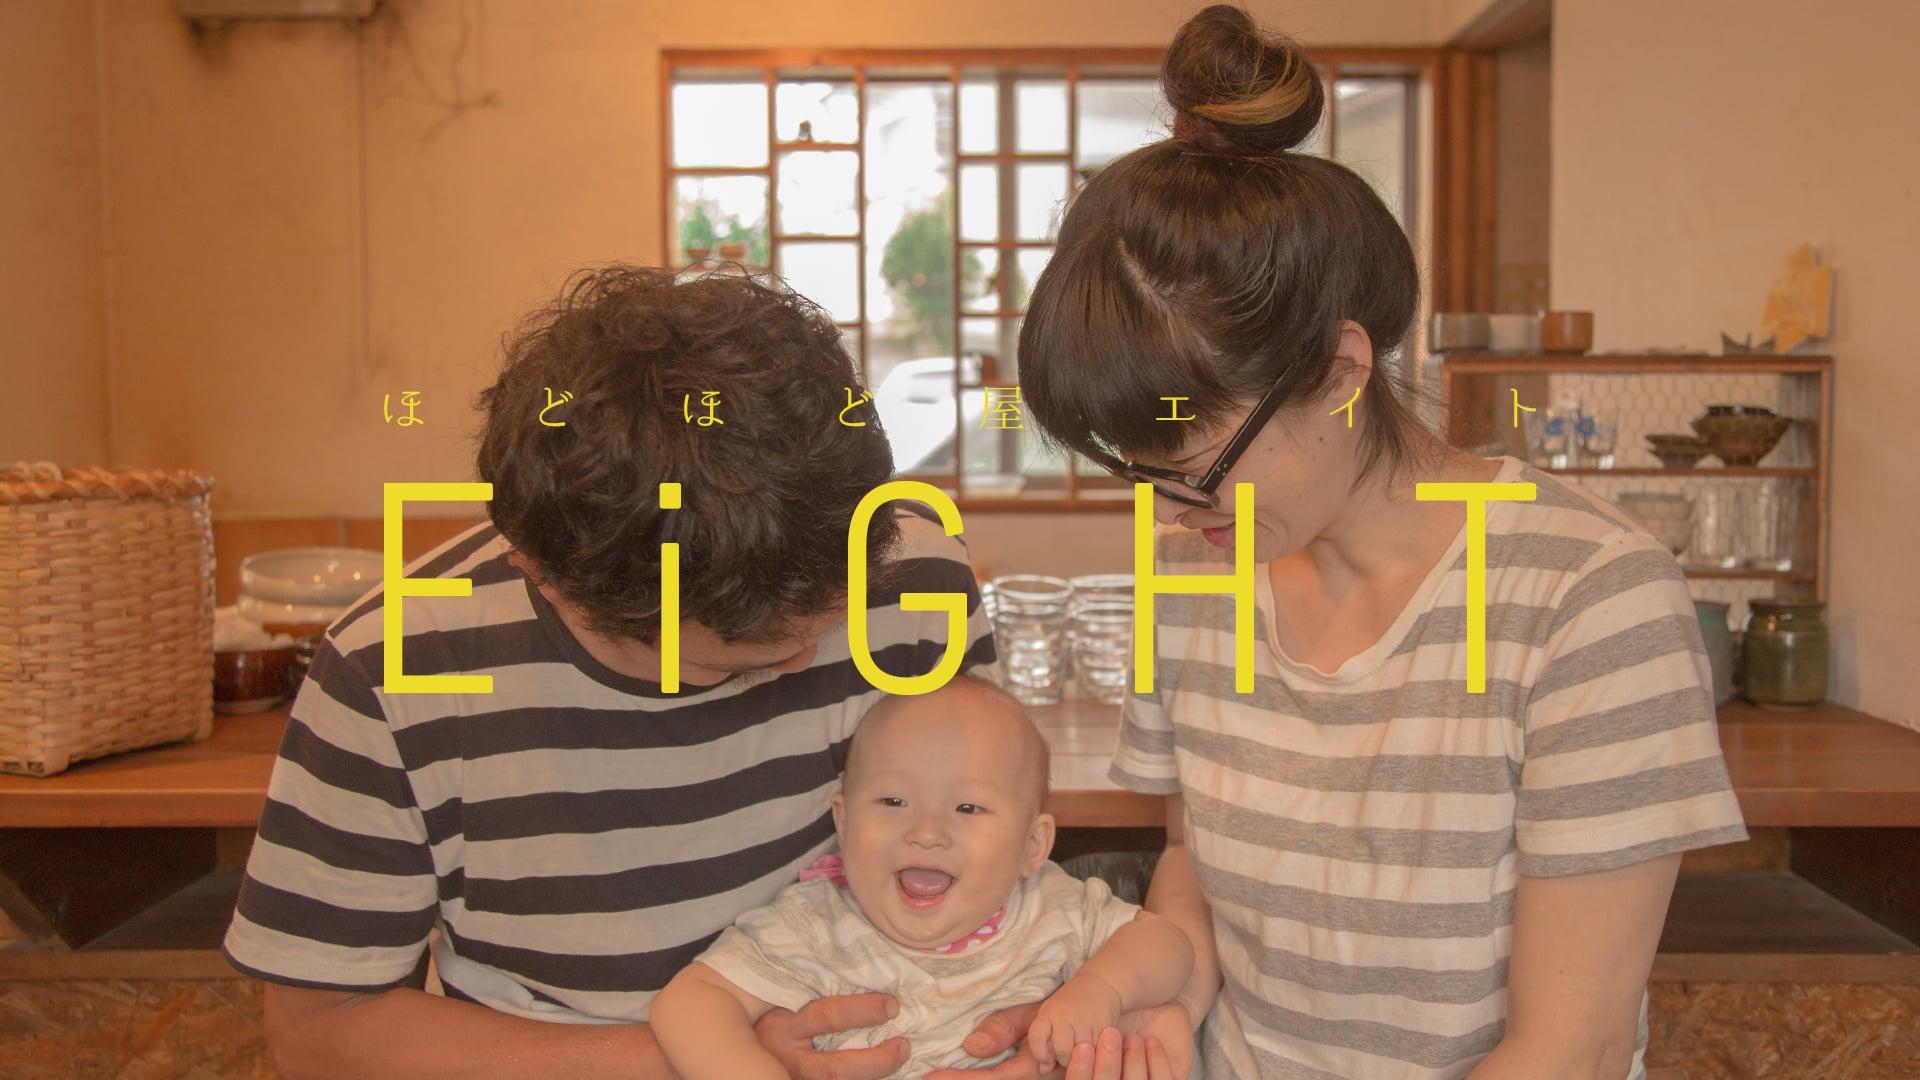 EiGHT - ほどほど屋エイト (Documentary Short Film)